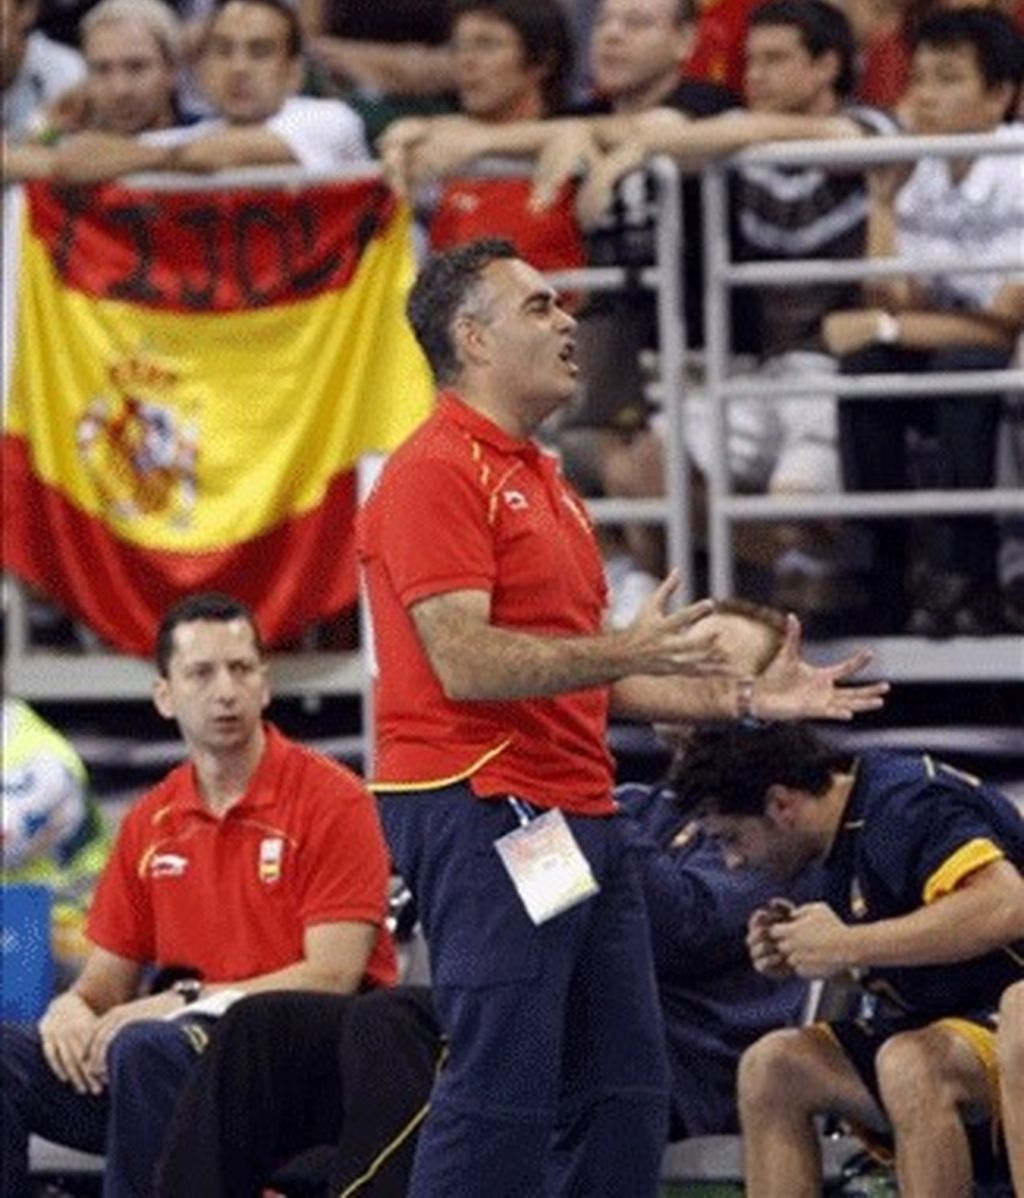 30-29. España vence a Polonia con un resultado ajustado